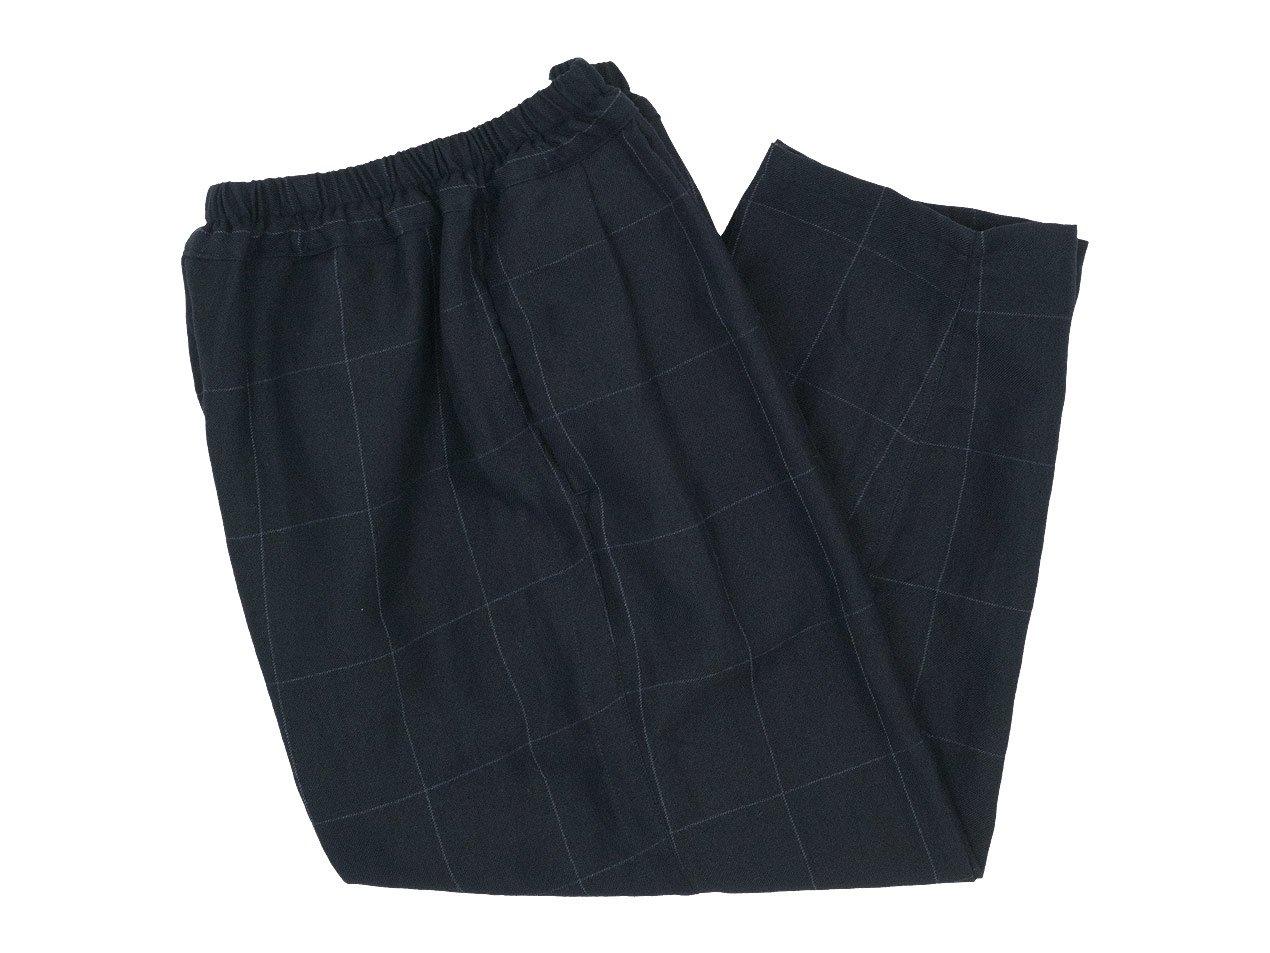 ordinary fits NARROW BALL PANTS WOOL LINEN CHECK